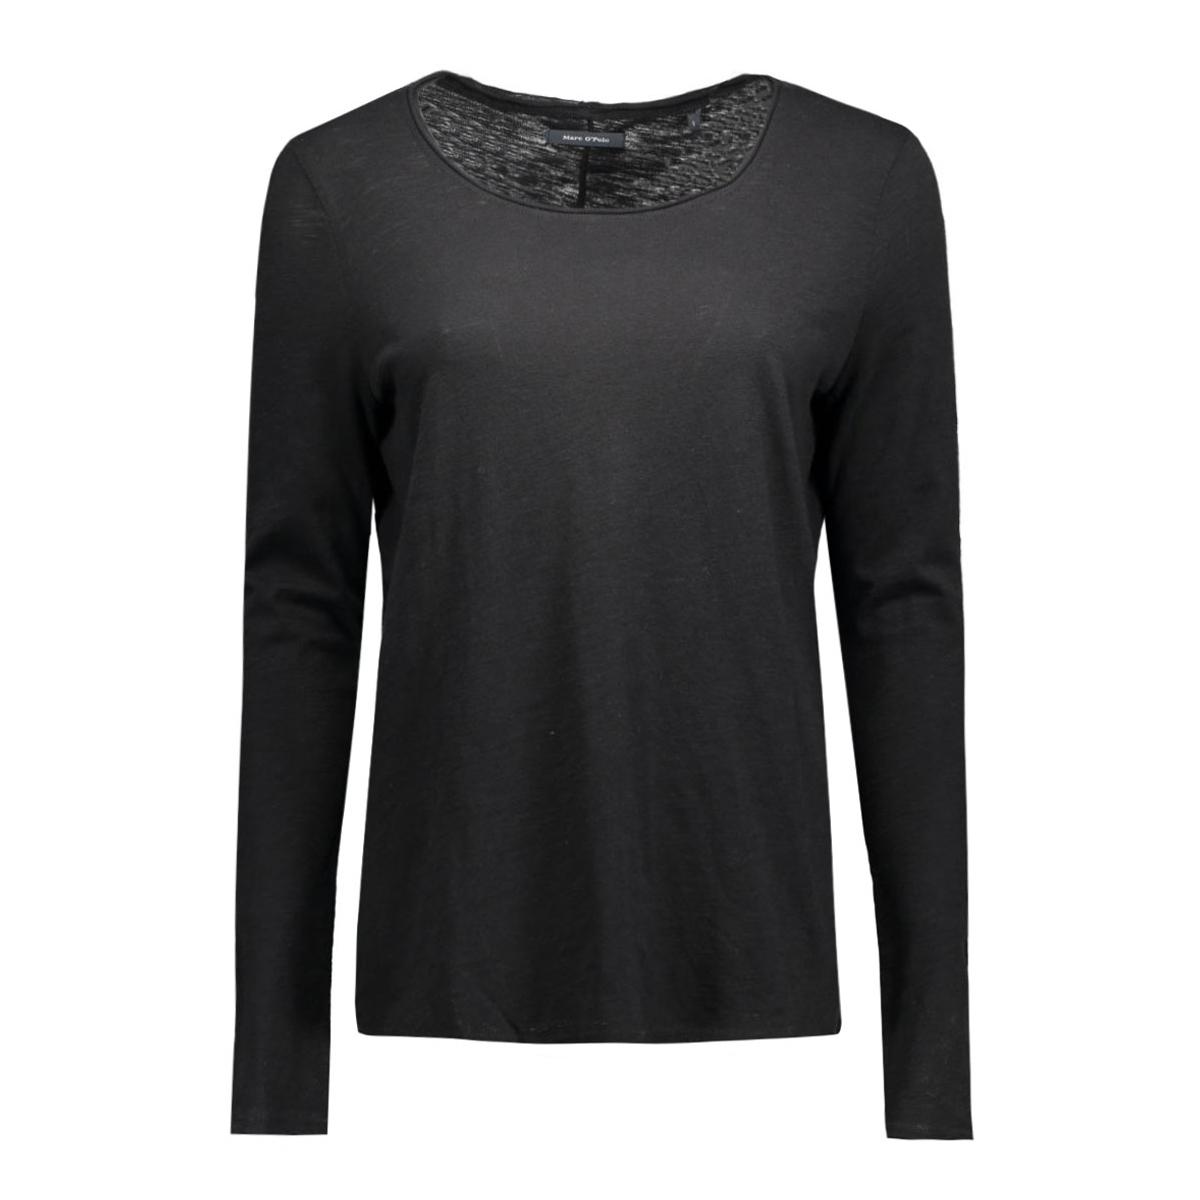 608 2155 52483 marc o`polo t-shirt 990 black